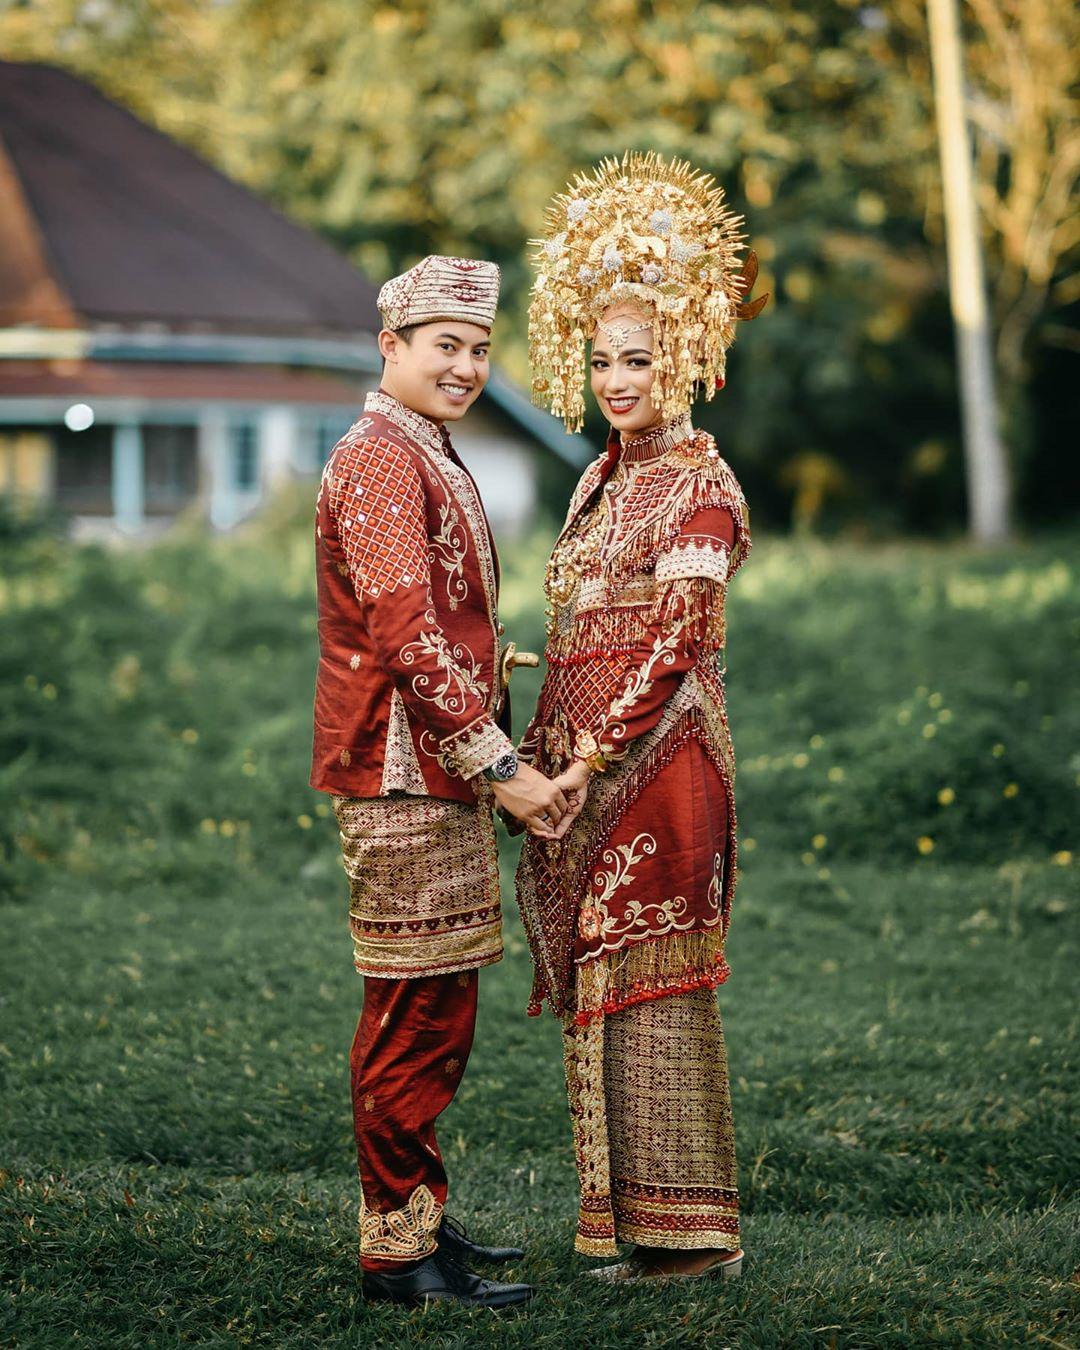 Baju Pengantin Minang Modern dan Islami Terbaik di Padang